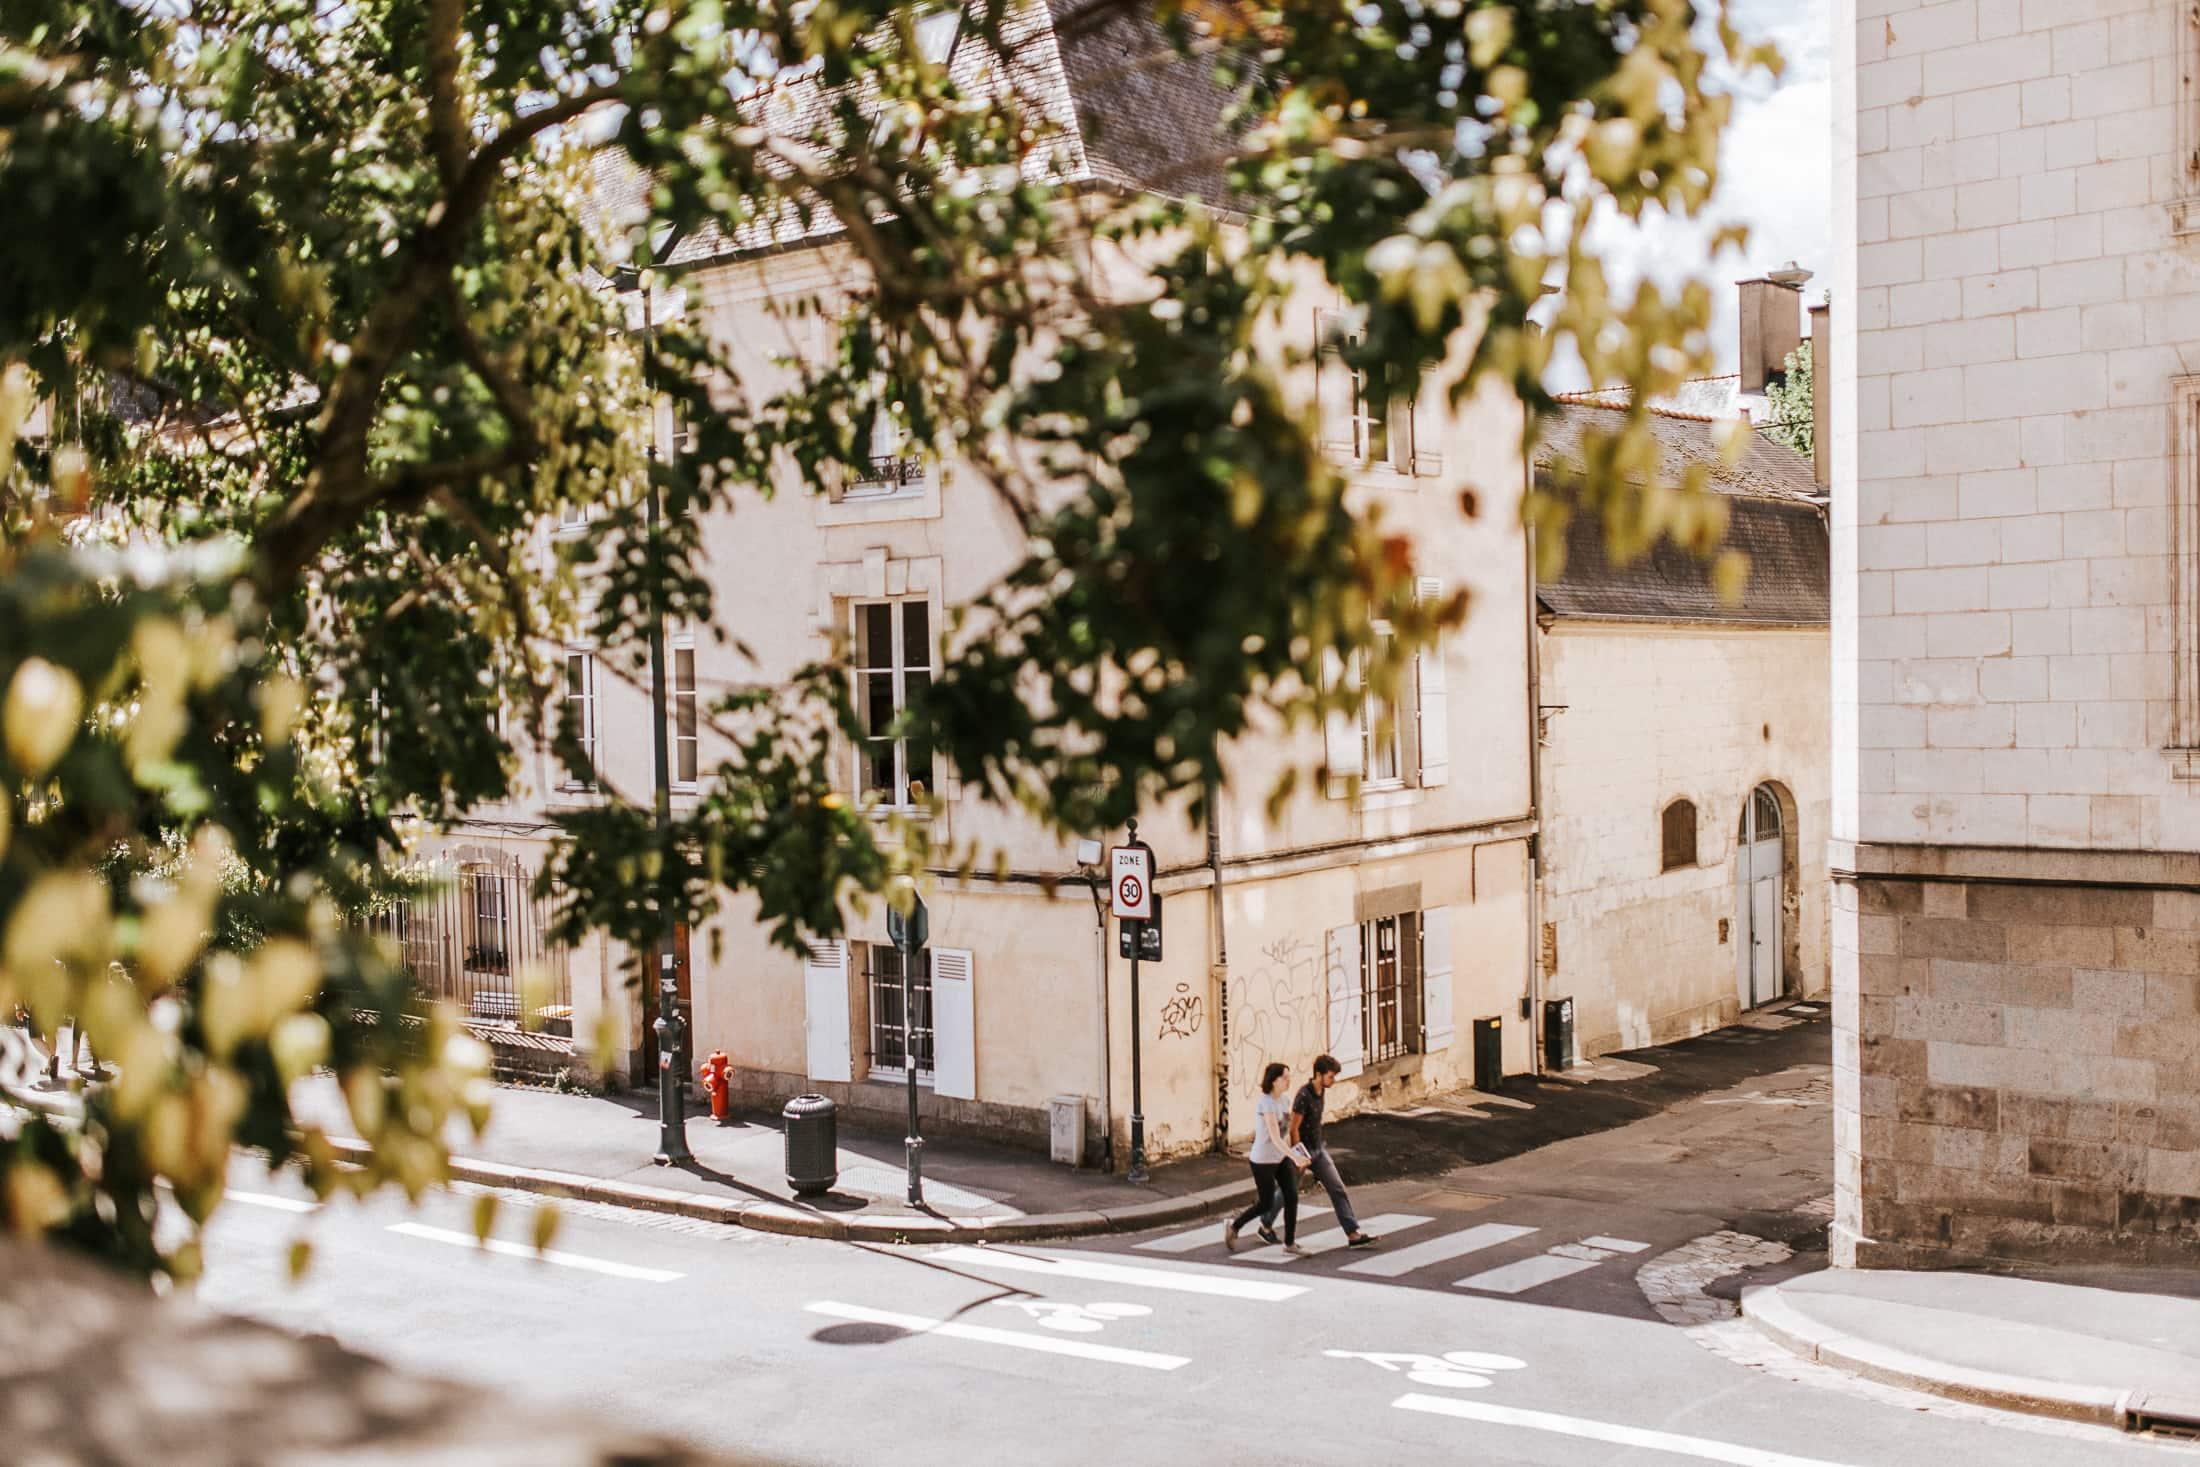 Une balade à Rennes : où manger, quoi visiter – partie 2